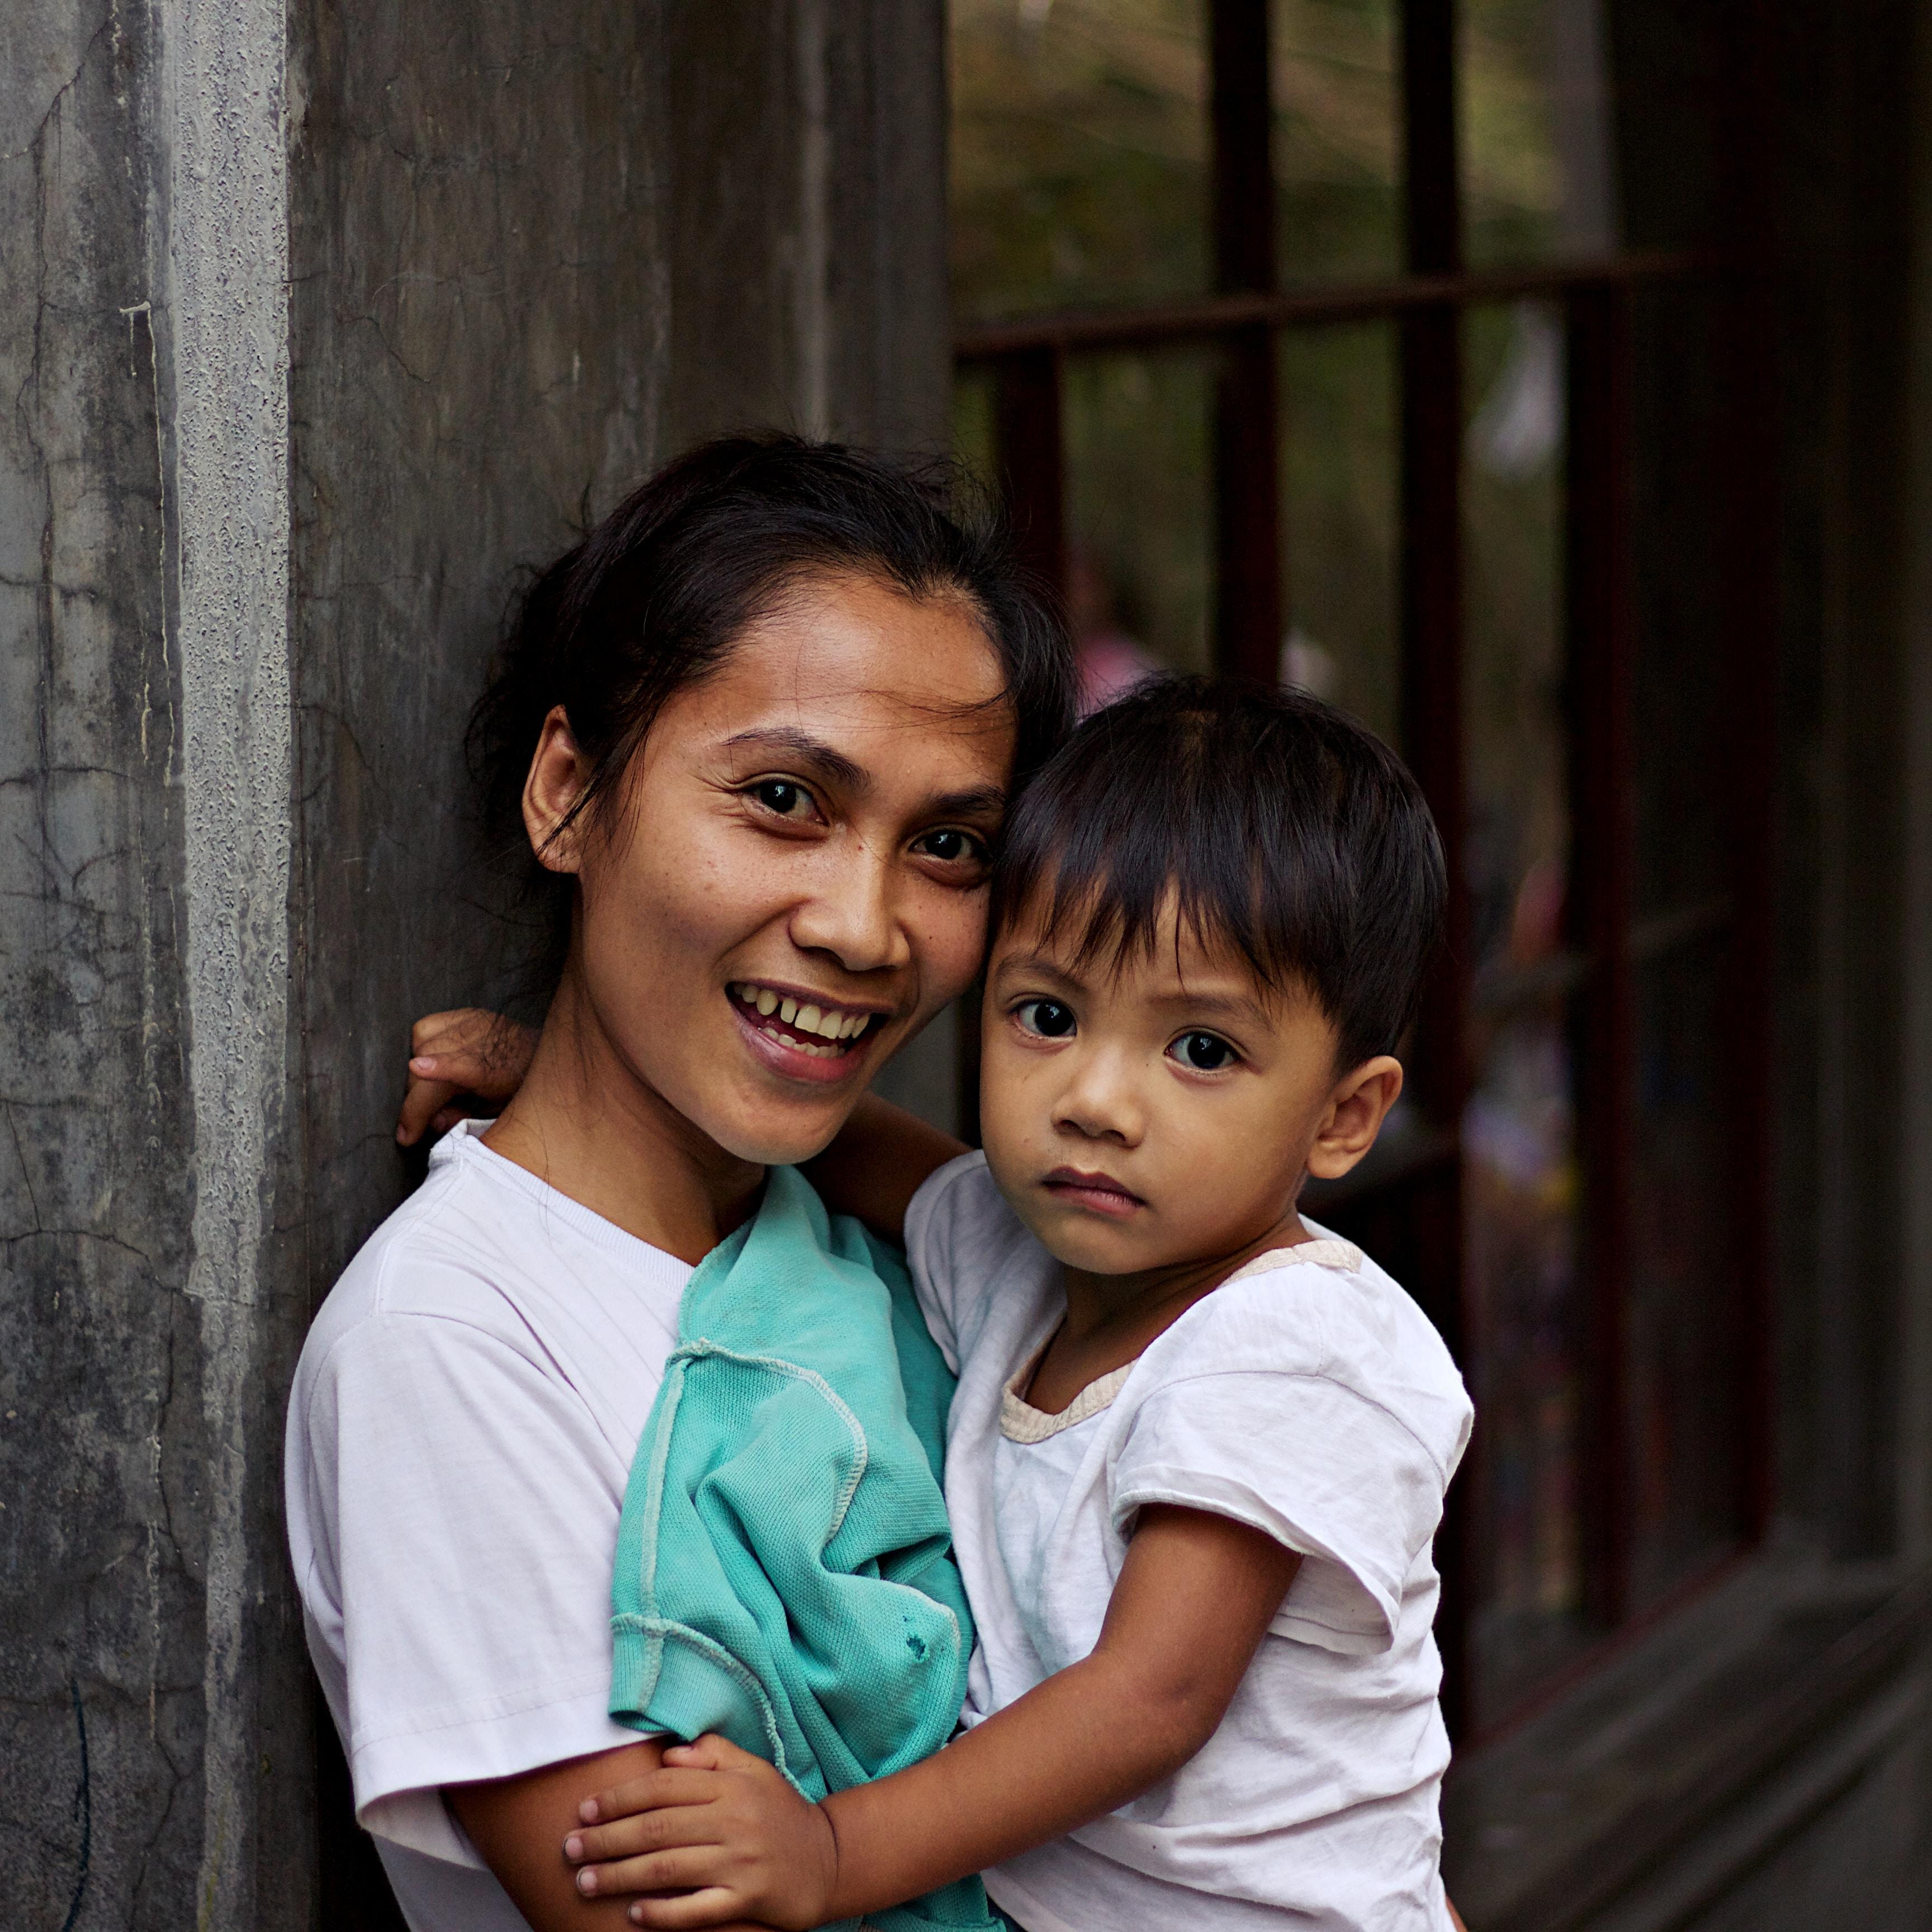 woman carrying a boy near metal frame